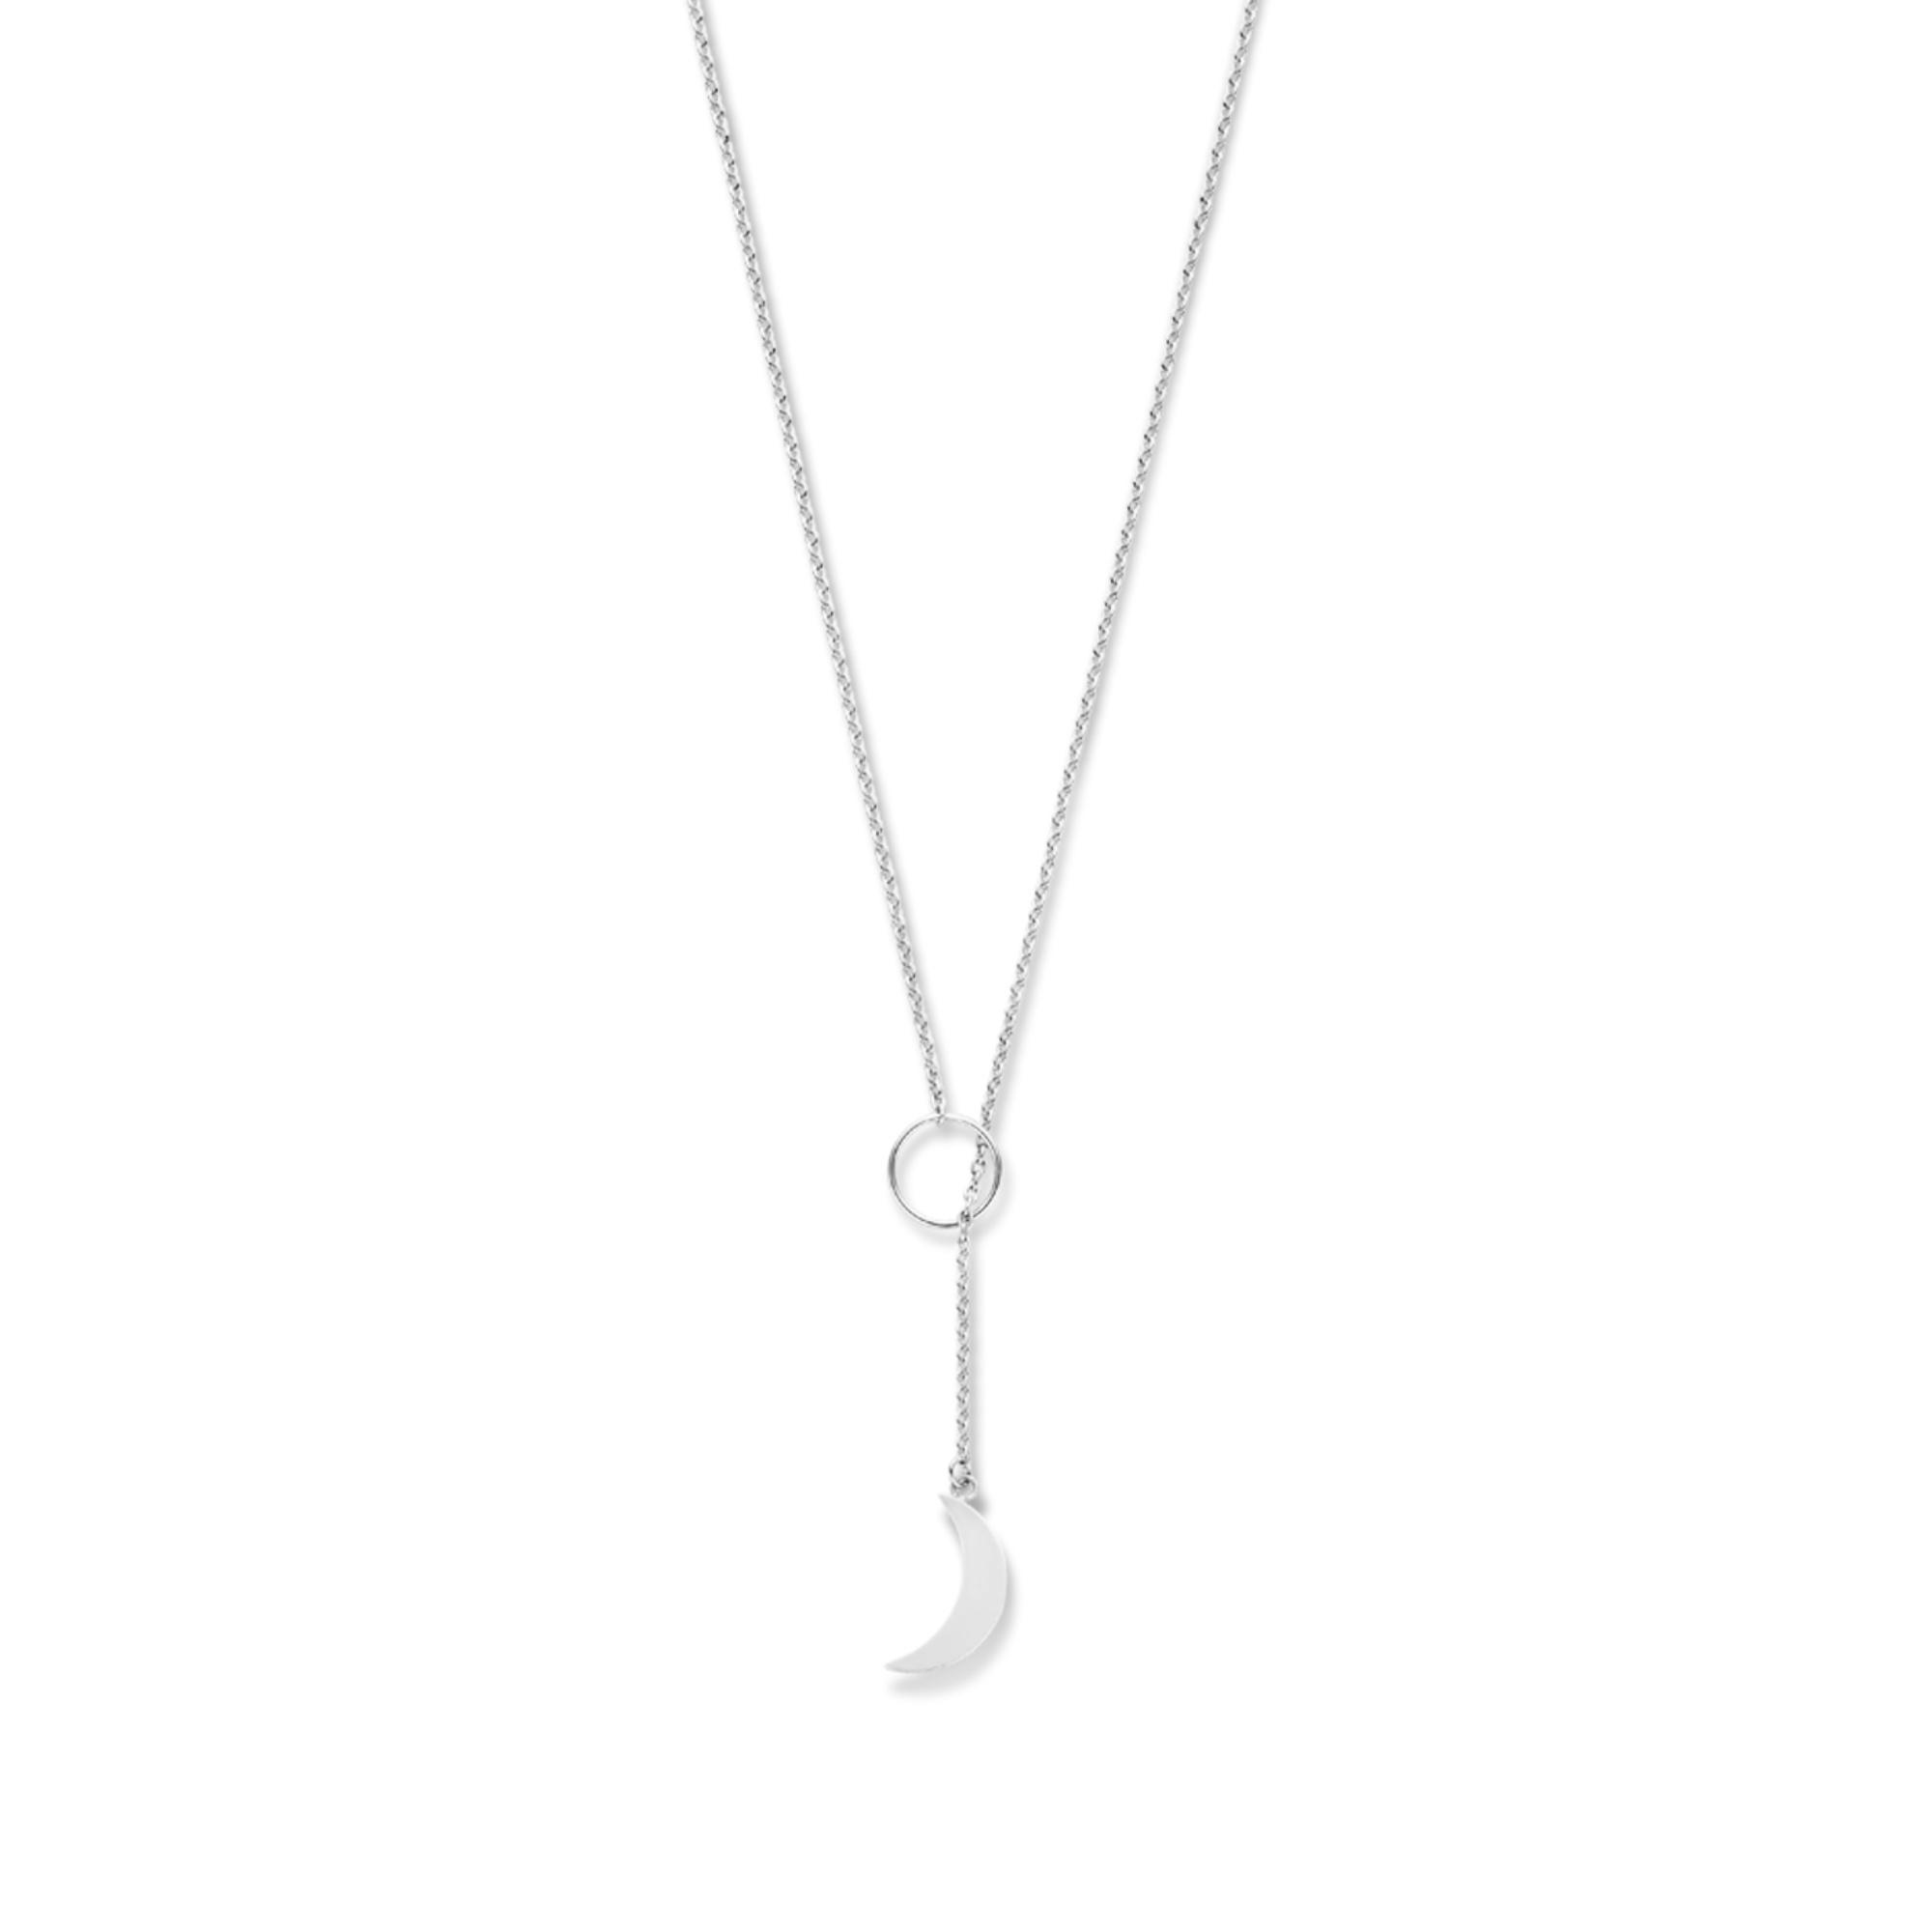 Violet Hamden Luna 925 sterling silver necklace with moon